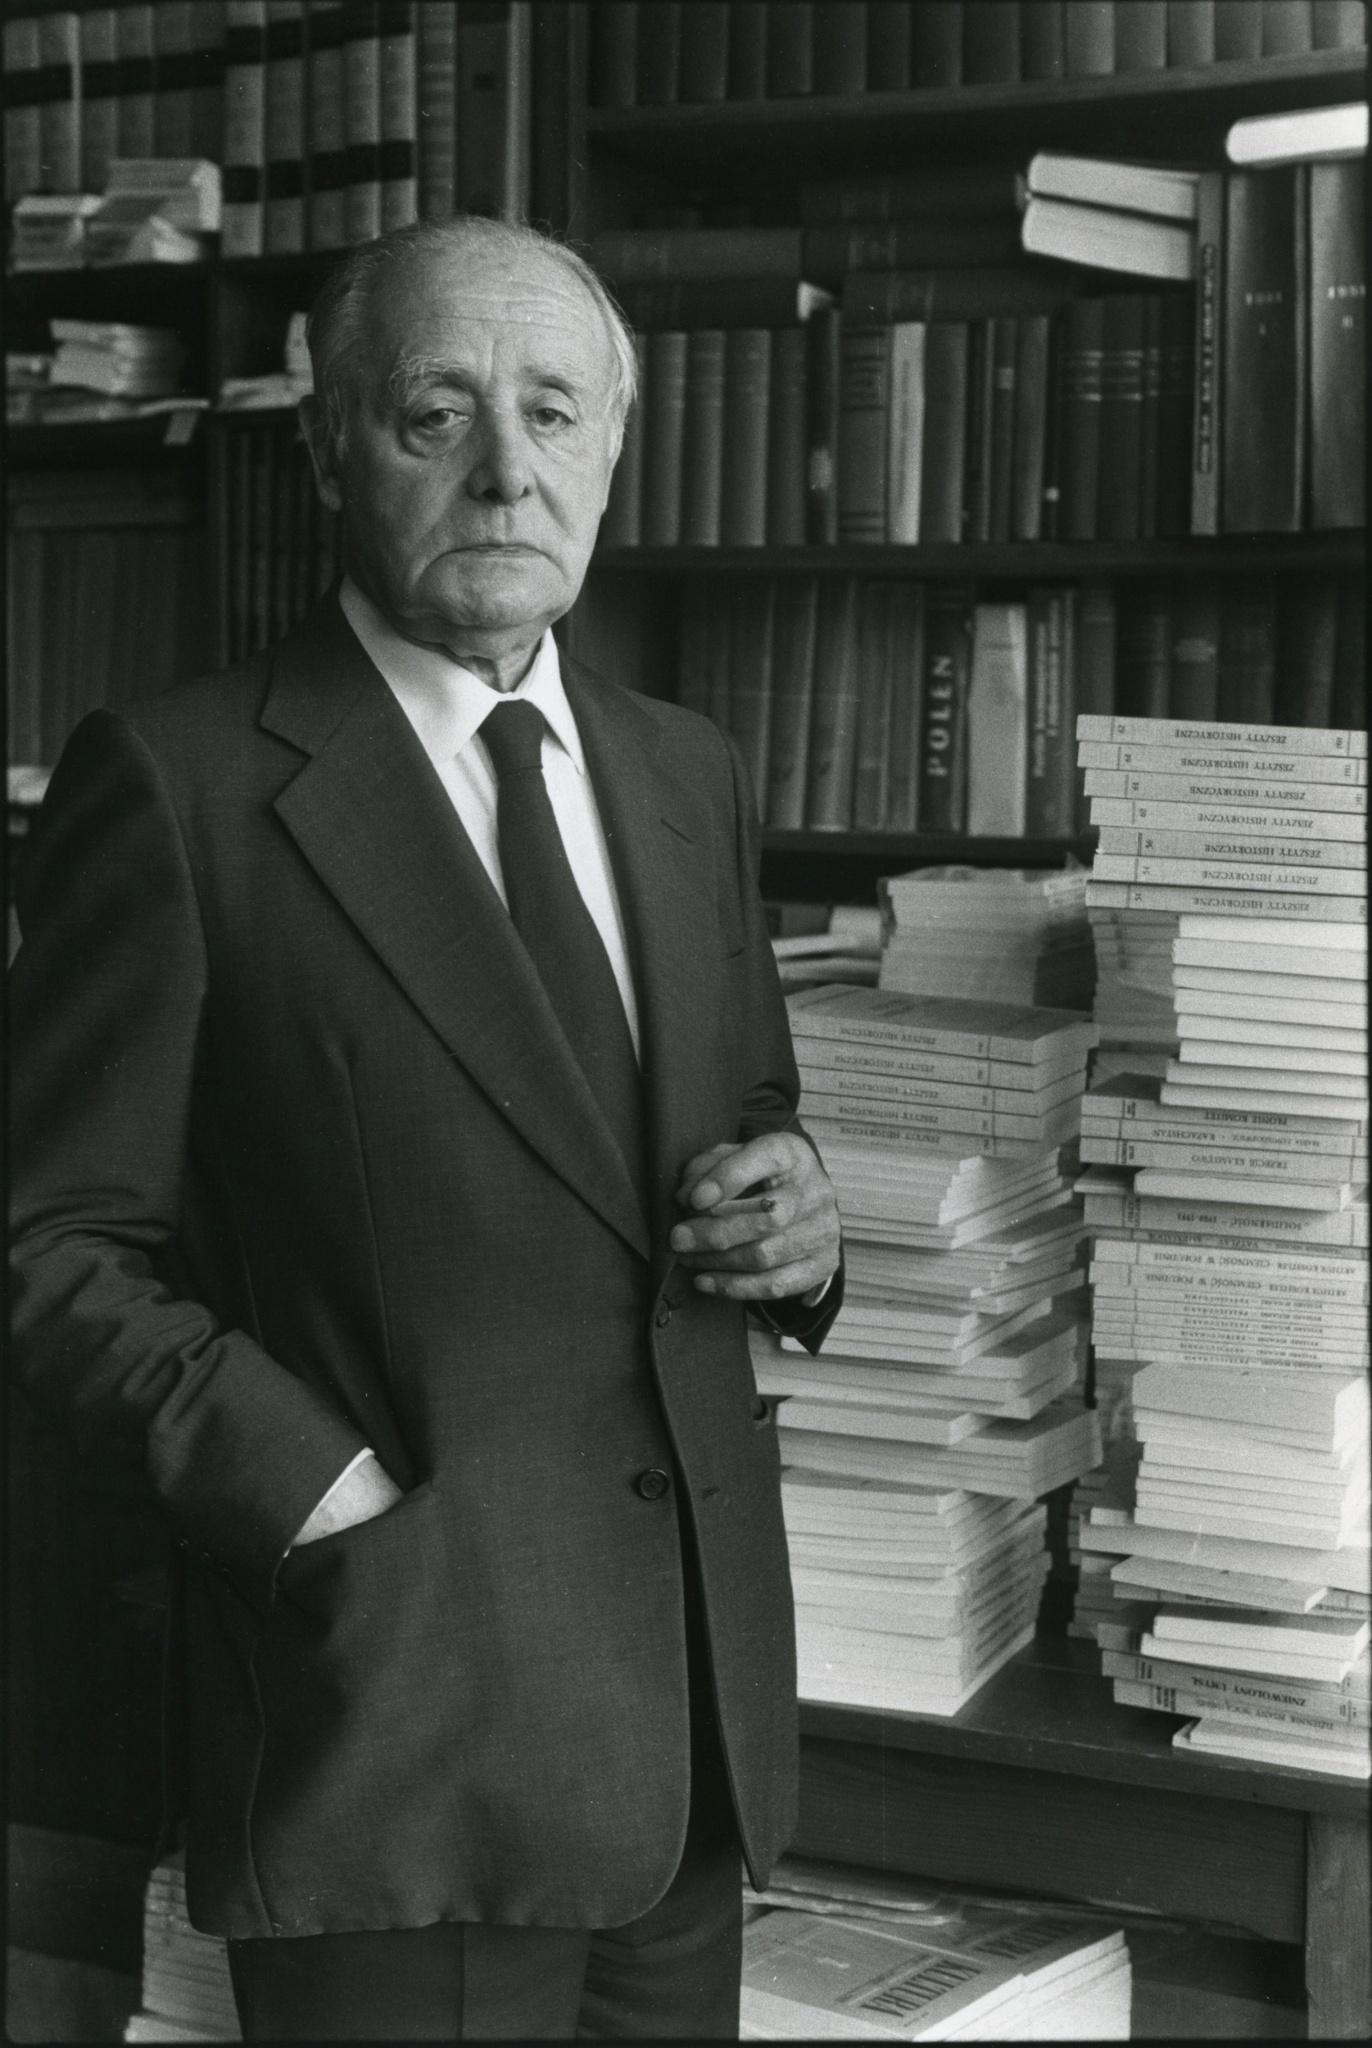 <div class='inner-box'><div class='close-desc'></div>  <span class='opis'>Jerzy Giedroyc na tle wydawnictw Instytutu Literackiego. Maisons-Laffitte, 1986.</span>  <div class='clearfix'></div><div class='clearfix'></div><span class='autor'>fot. Bolesław Edelhajt</span>  </div>